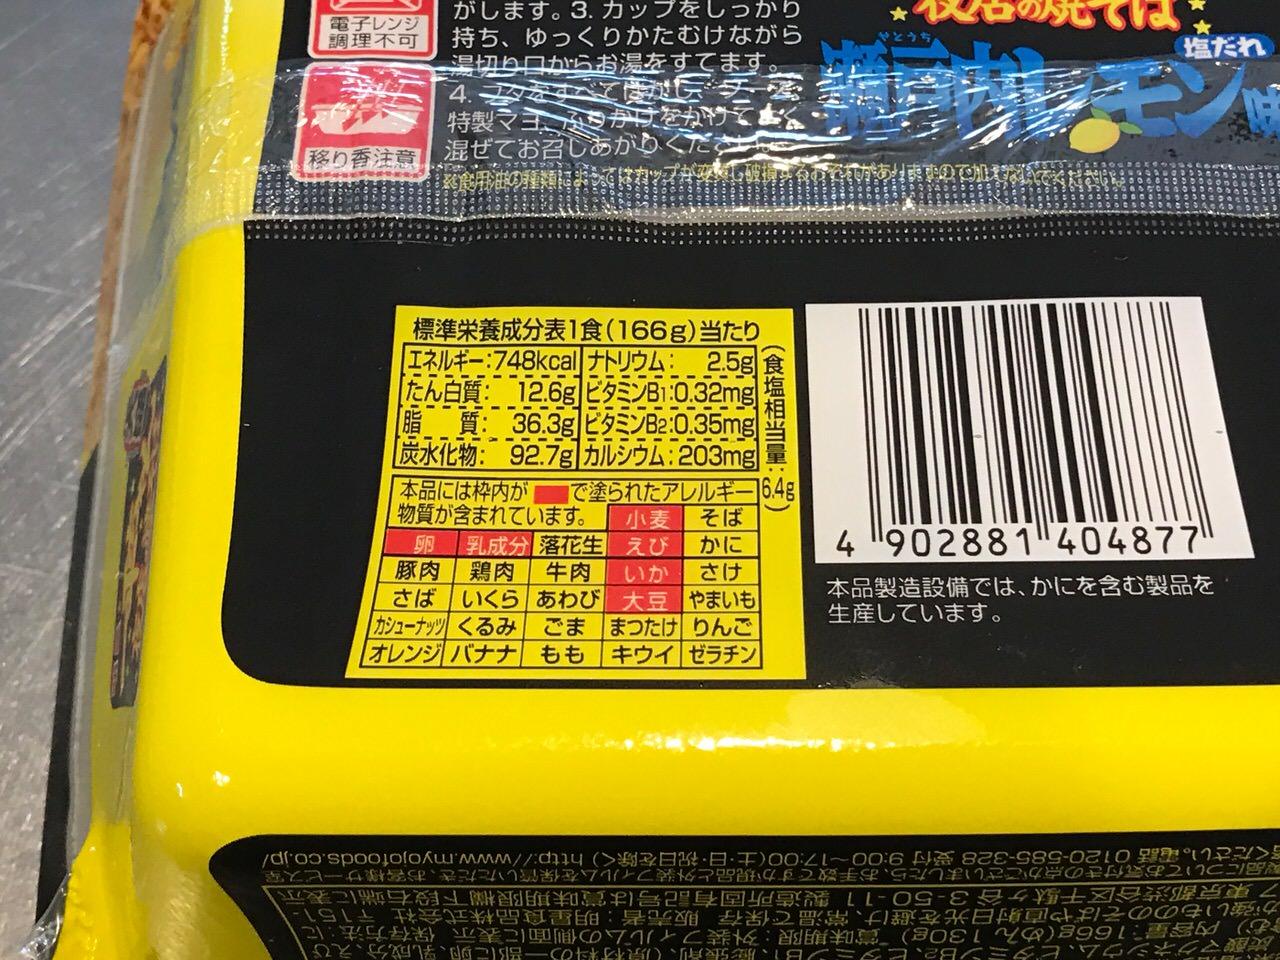 Setouchi lemon 9224